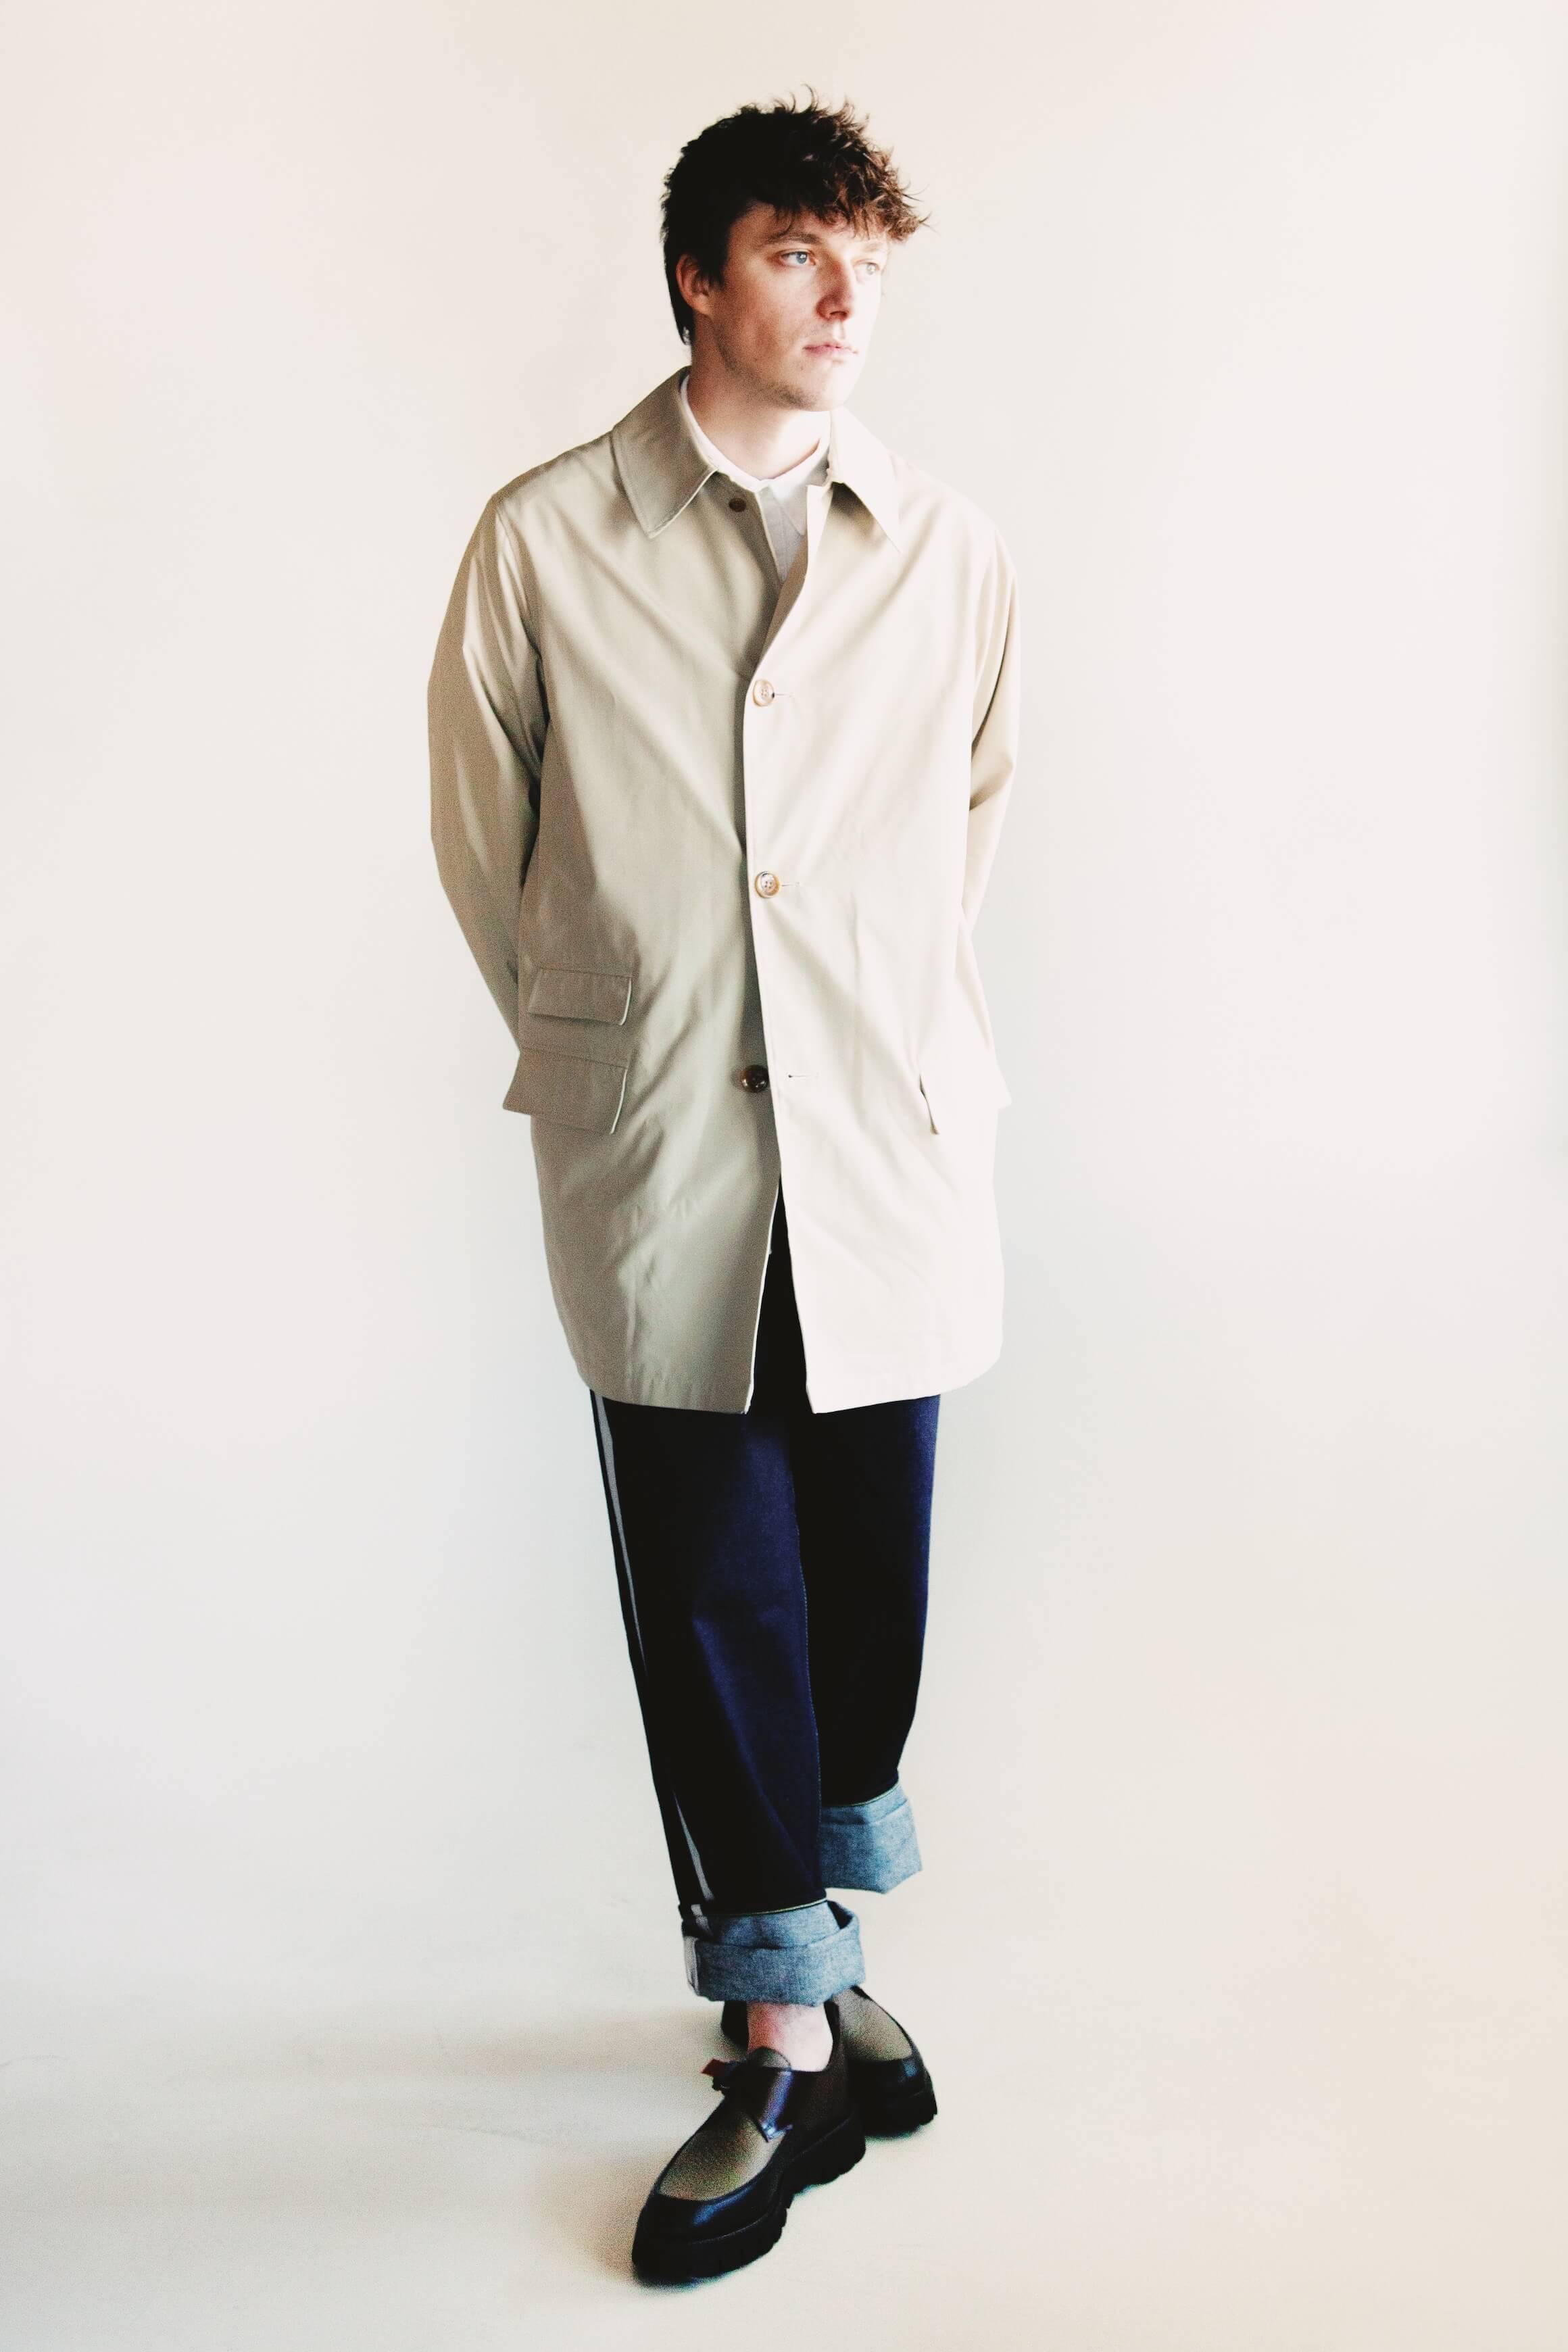 beams plus travel coat, engineered garments short collar shirt, visvim ict ss hakama pants and hender scheme fidmonk shoes on body